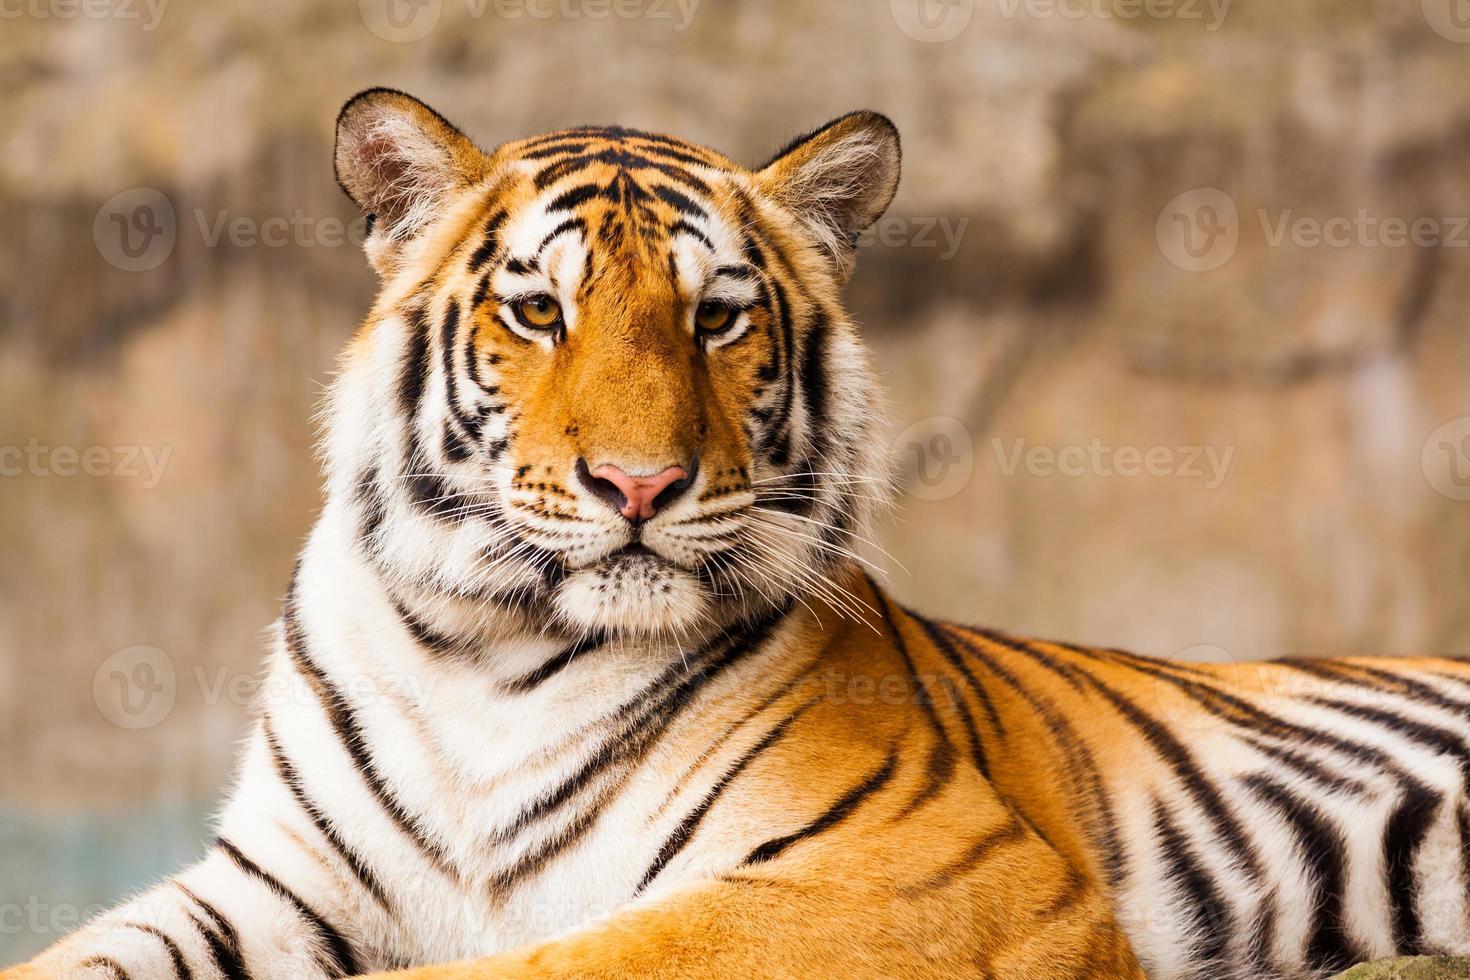 Big Tiger staring photo